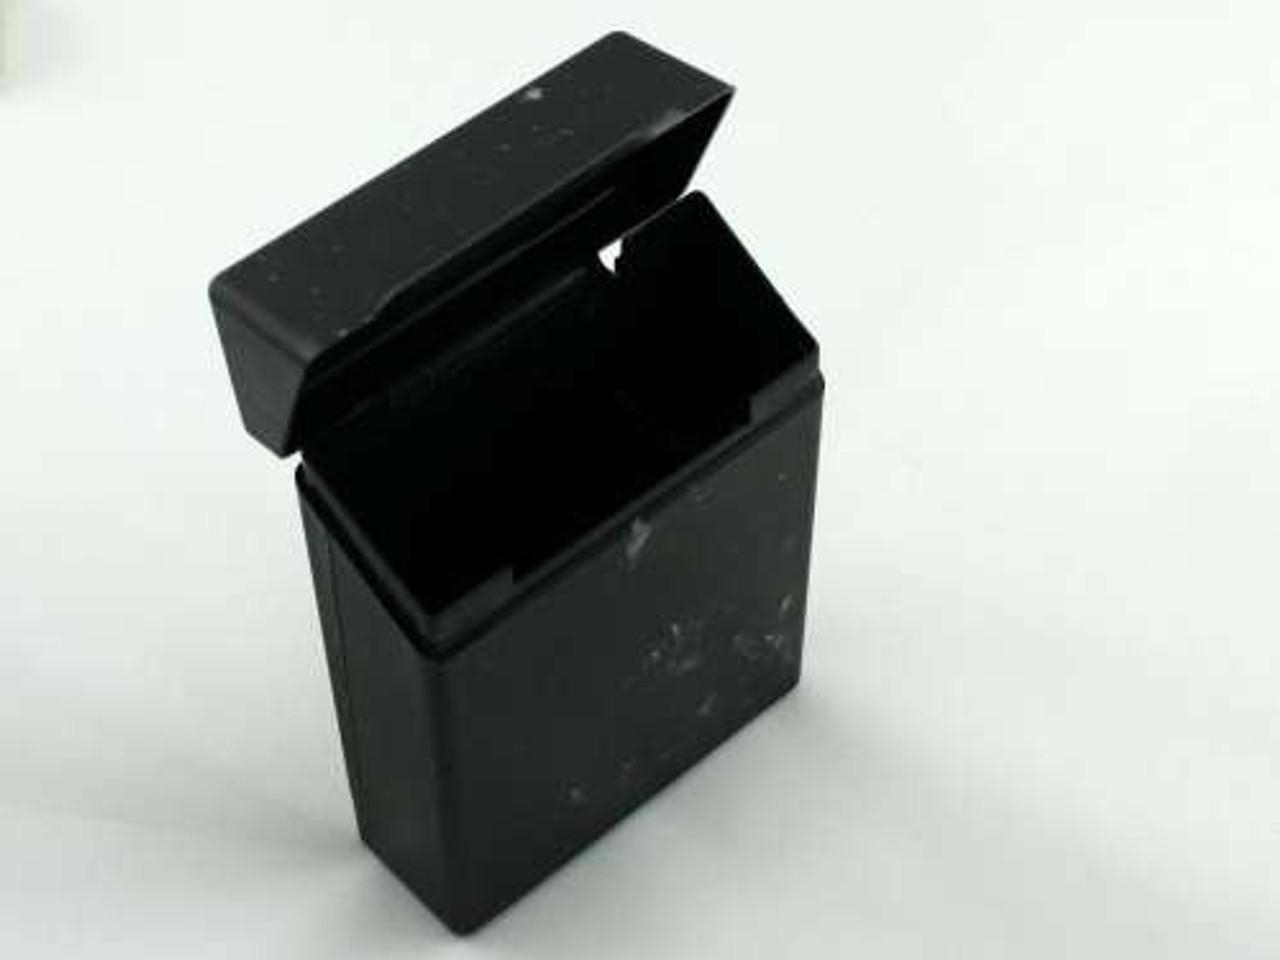 Black Marble Cigarette Pack Holder